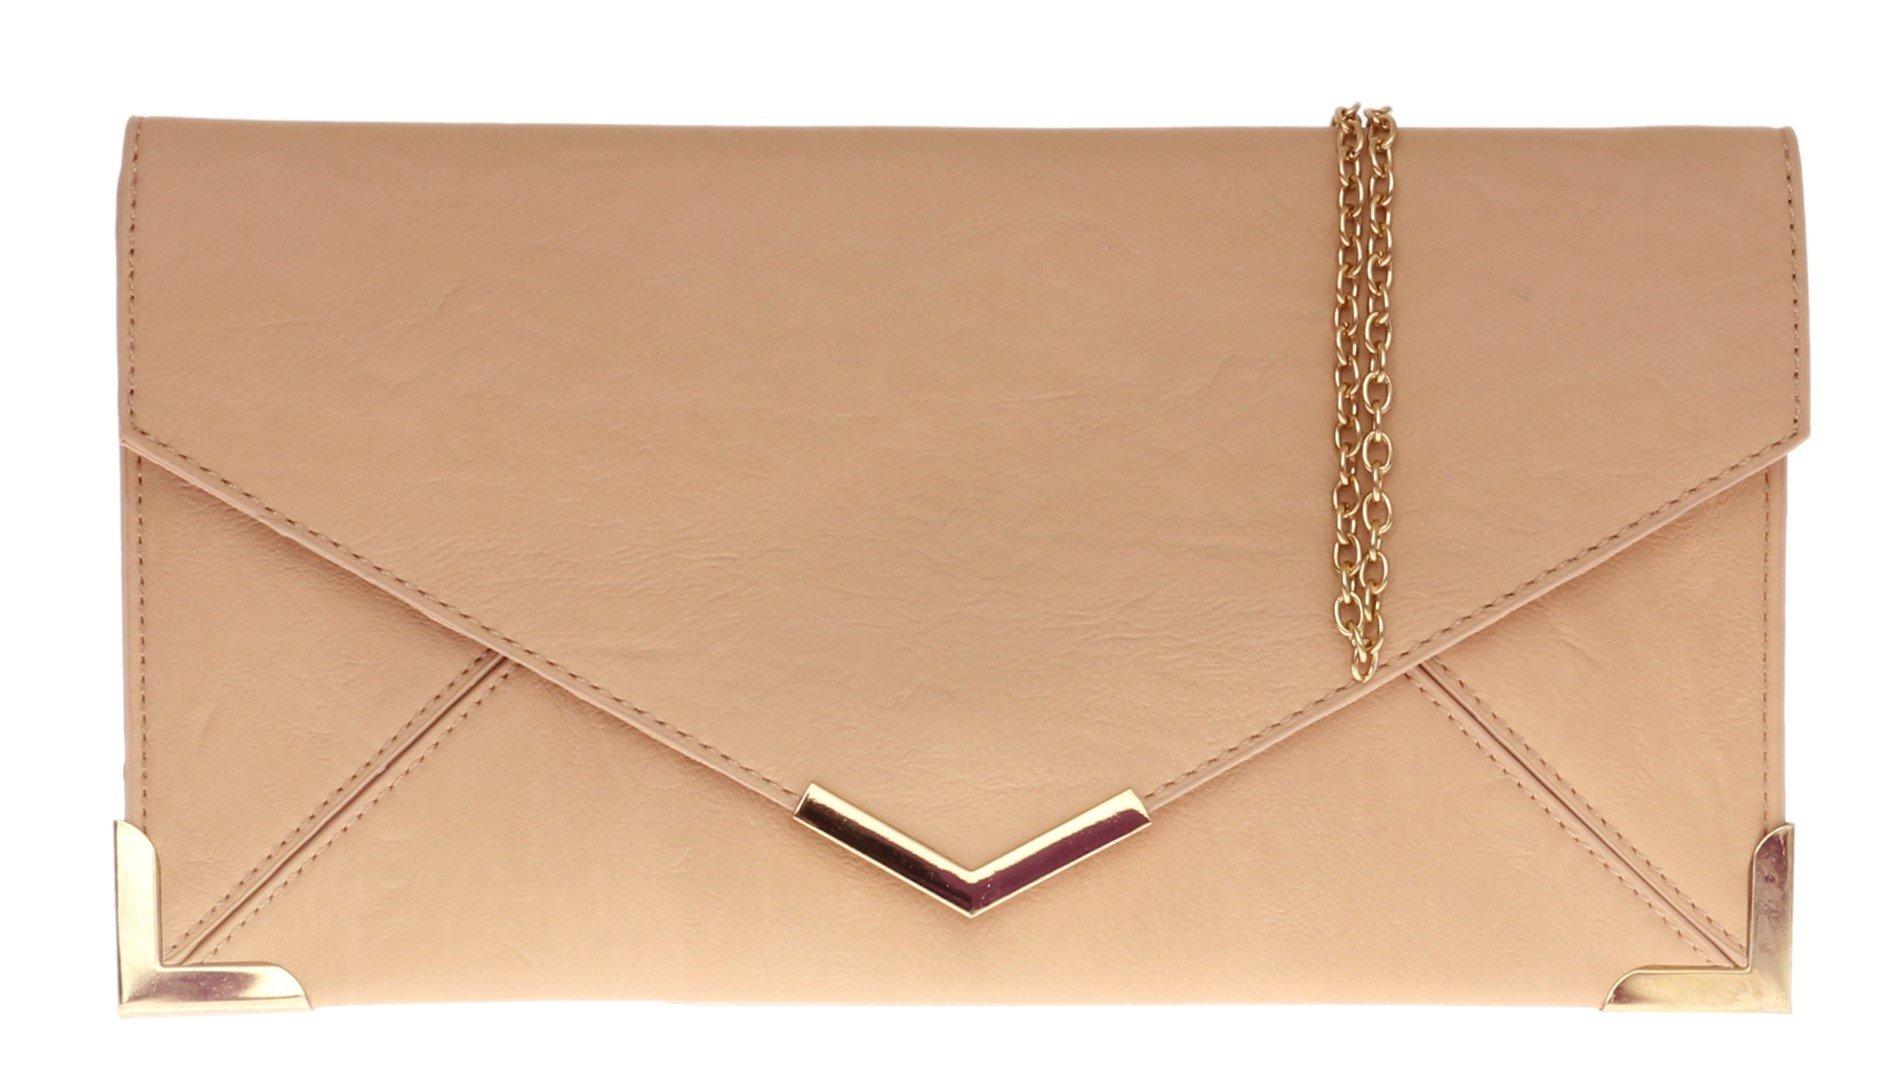 Girly HandBags New Neon Nude Ladies Clutch Bag Vintage Envelope Gold Trim Flat Small Summer